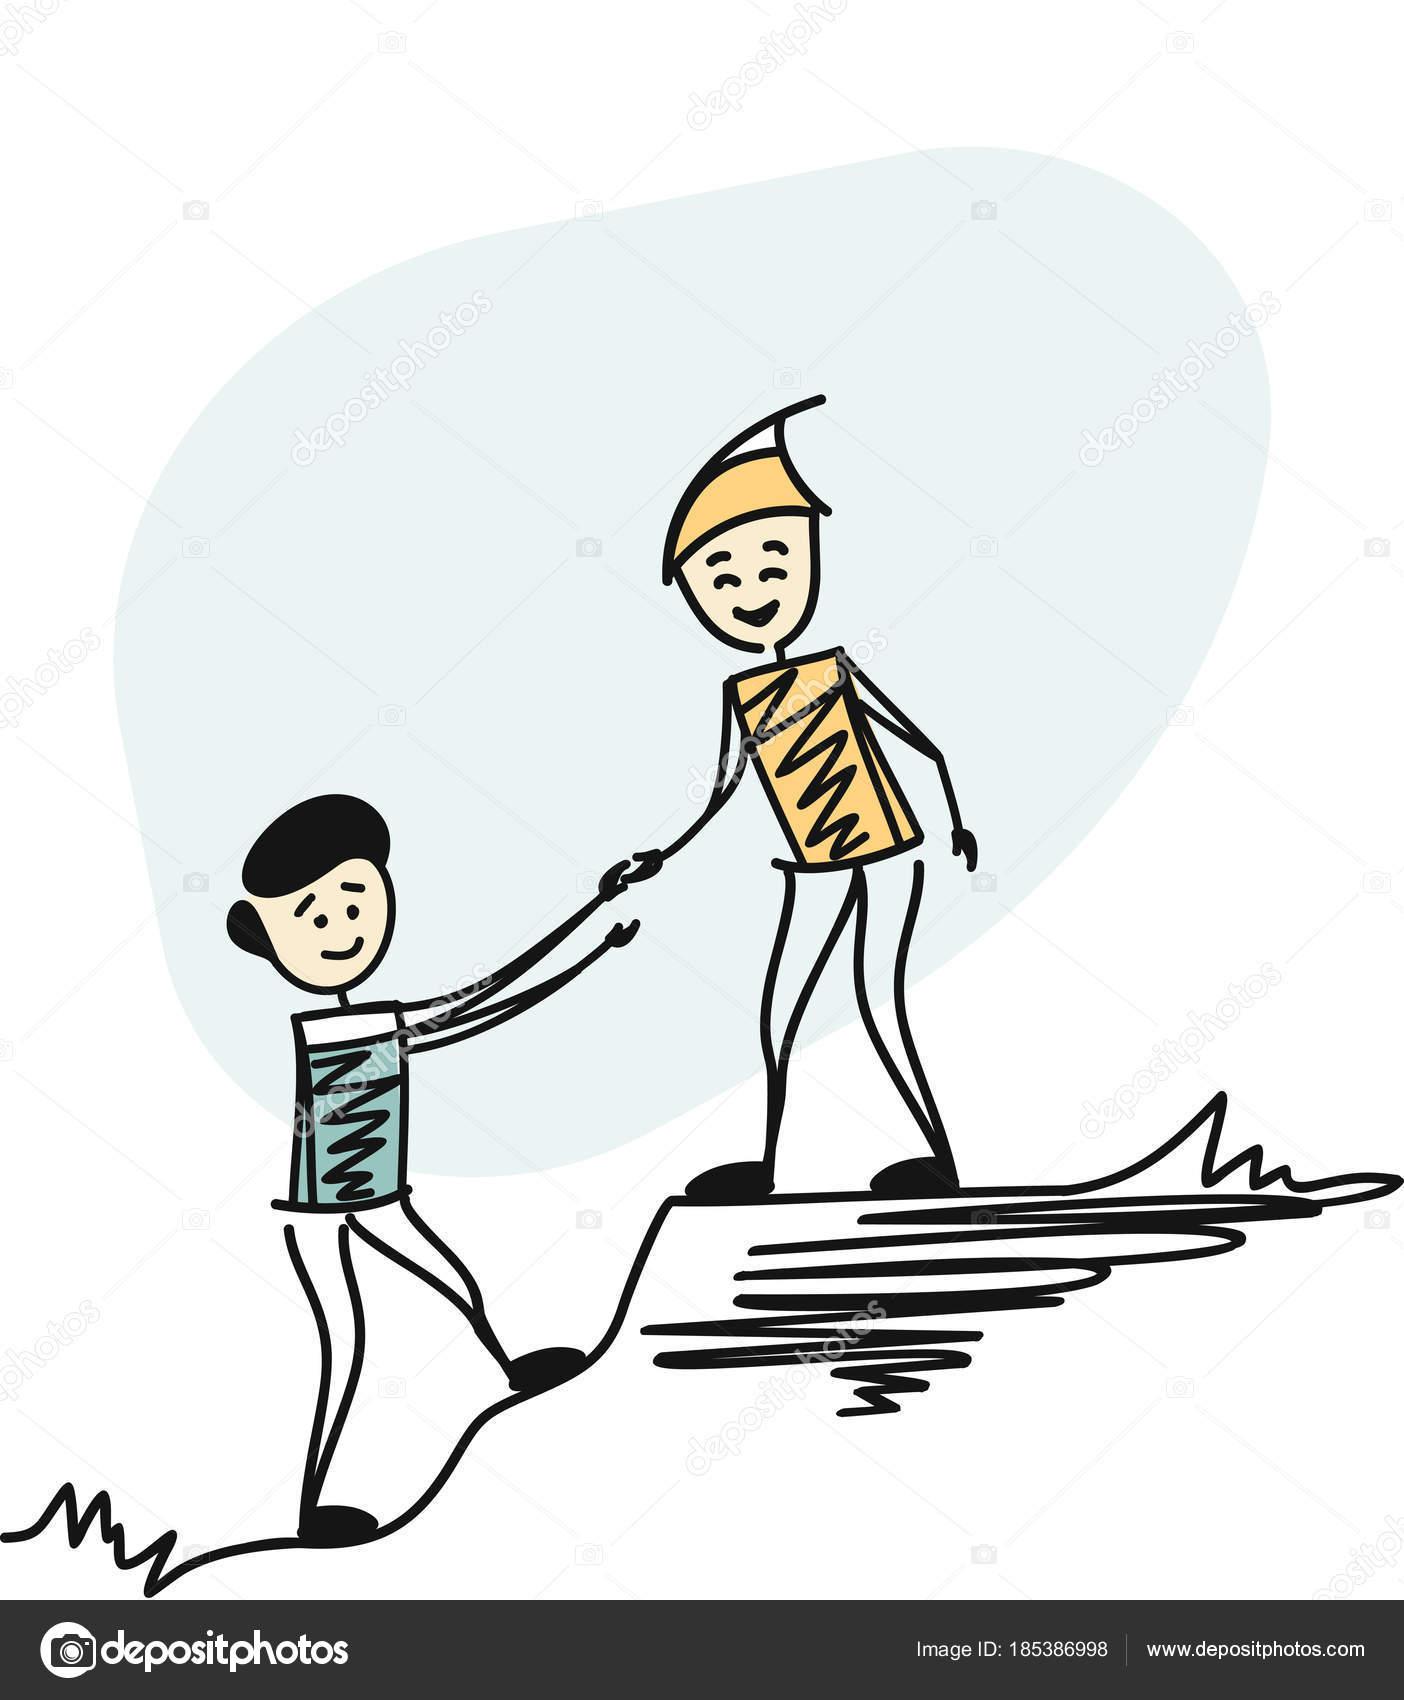 Helping Each Other: Man Hiking Help Each Other, Helping Team Work. Cartoon